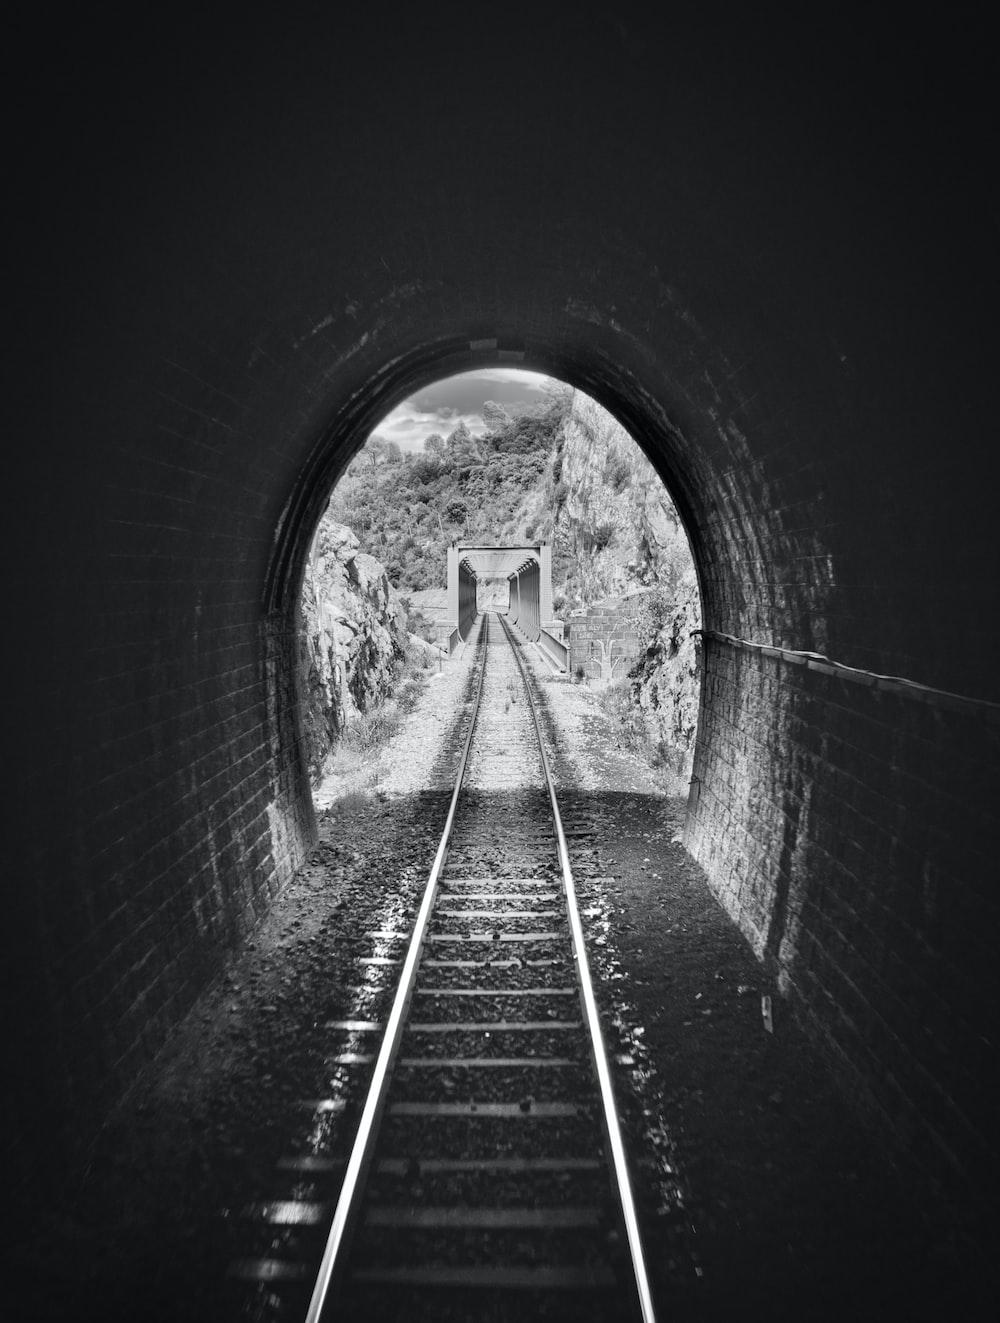 railway in tunnel